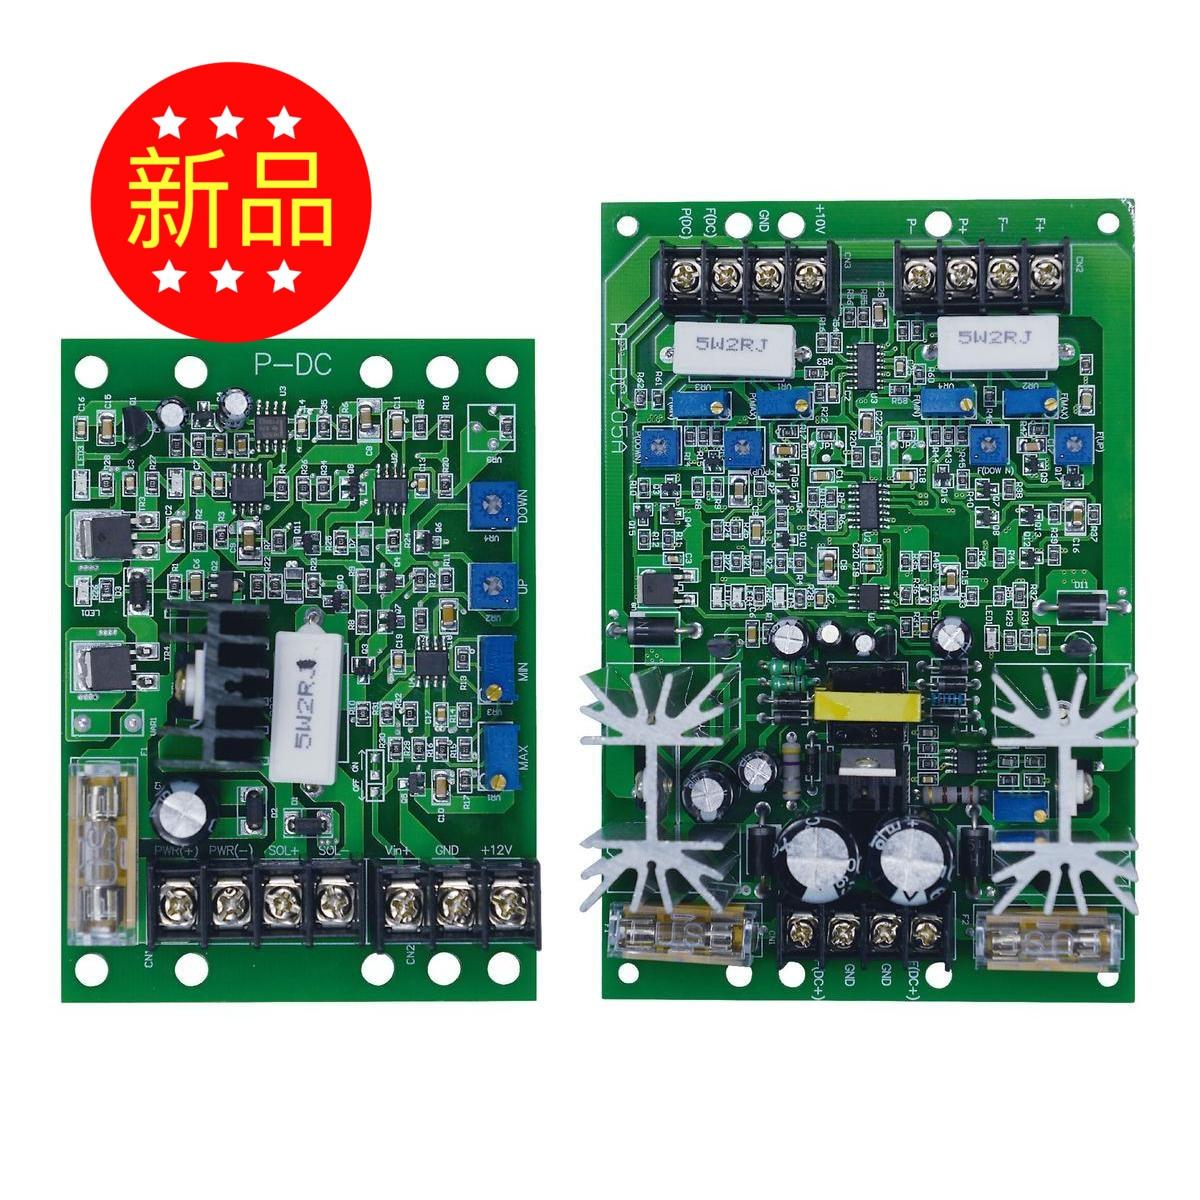 Proportional Valve Amplifier, PF-DC-24 Solenoid Valve Amplifier, Proportional Valve Controller